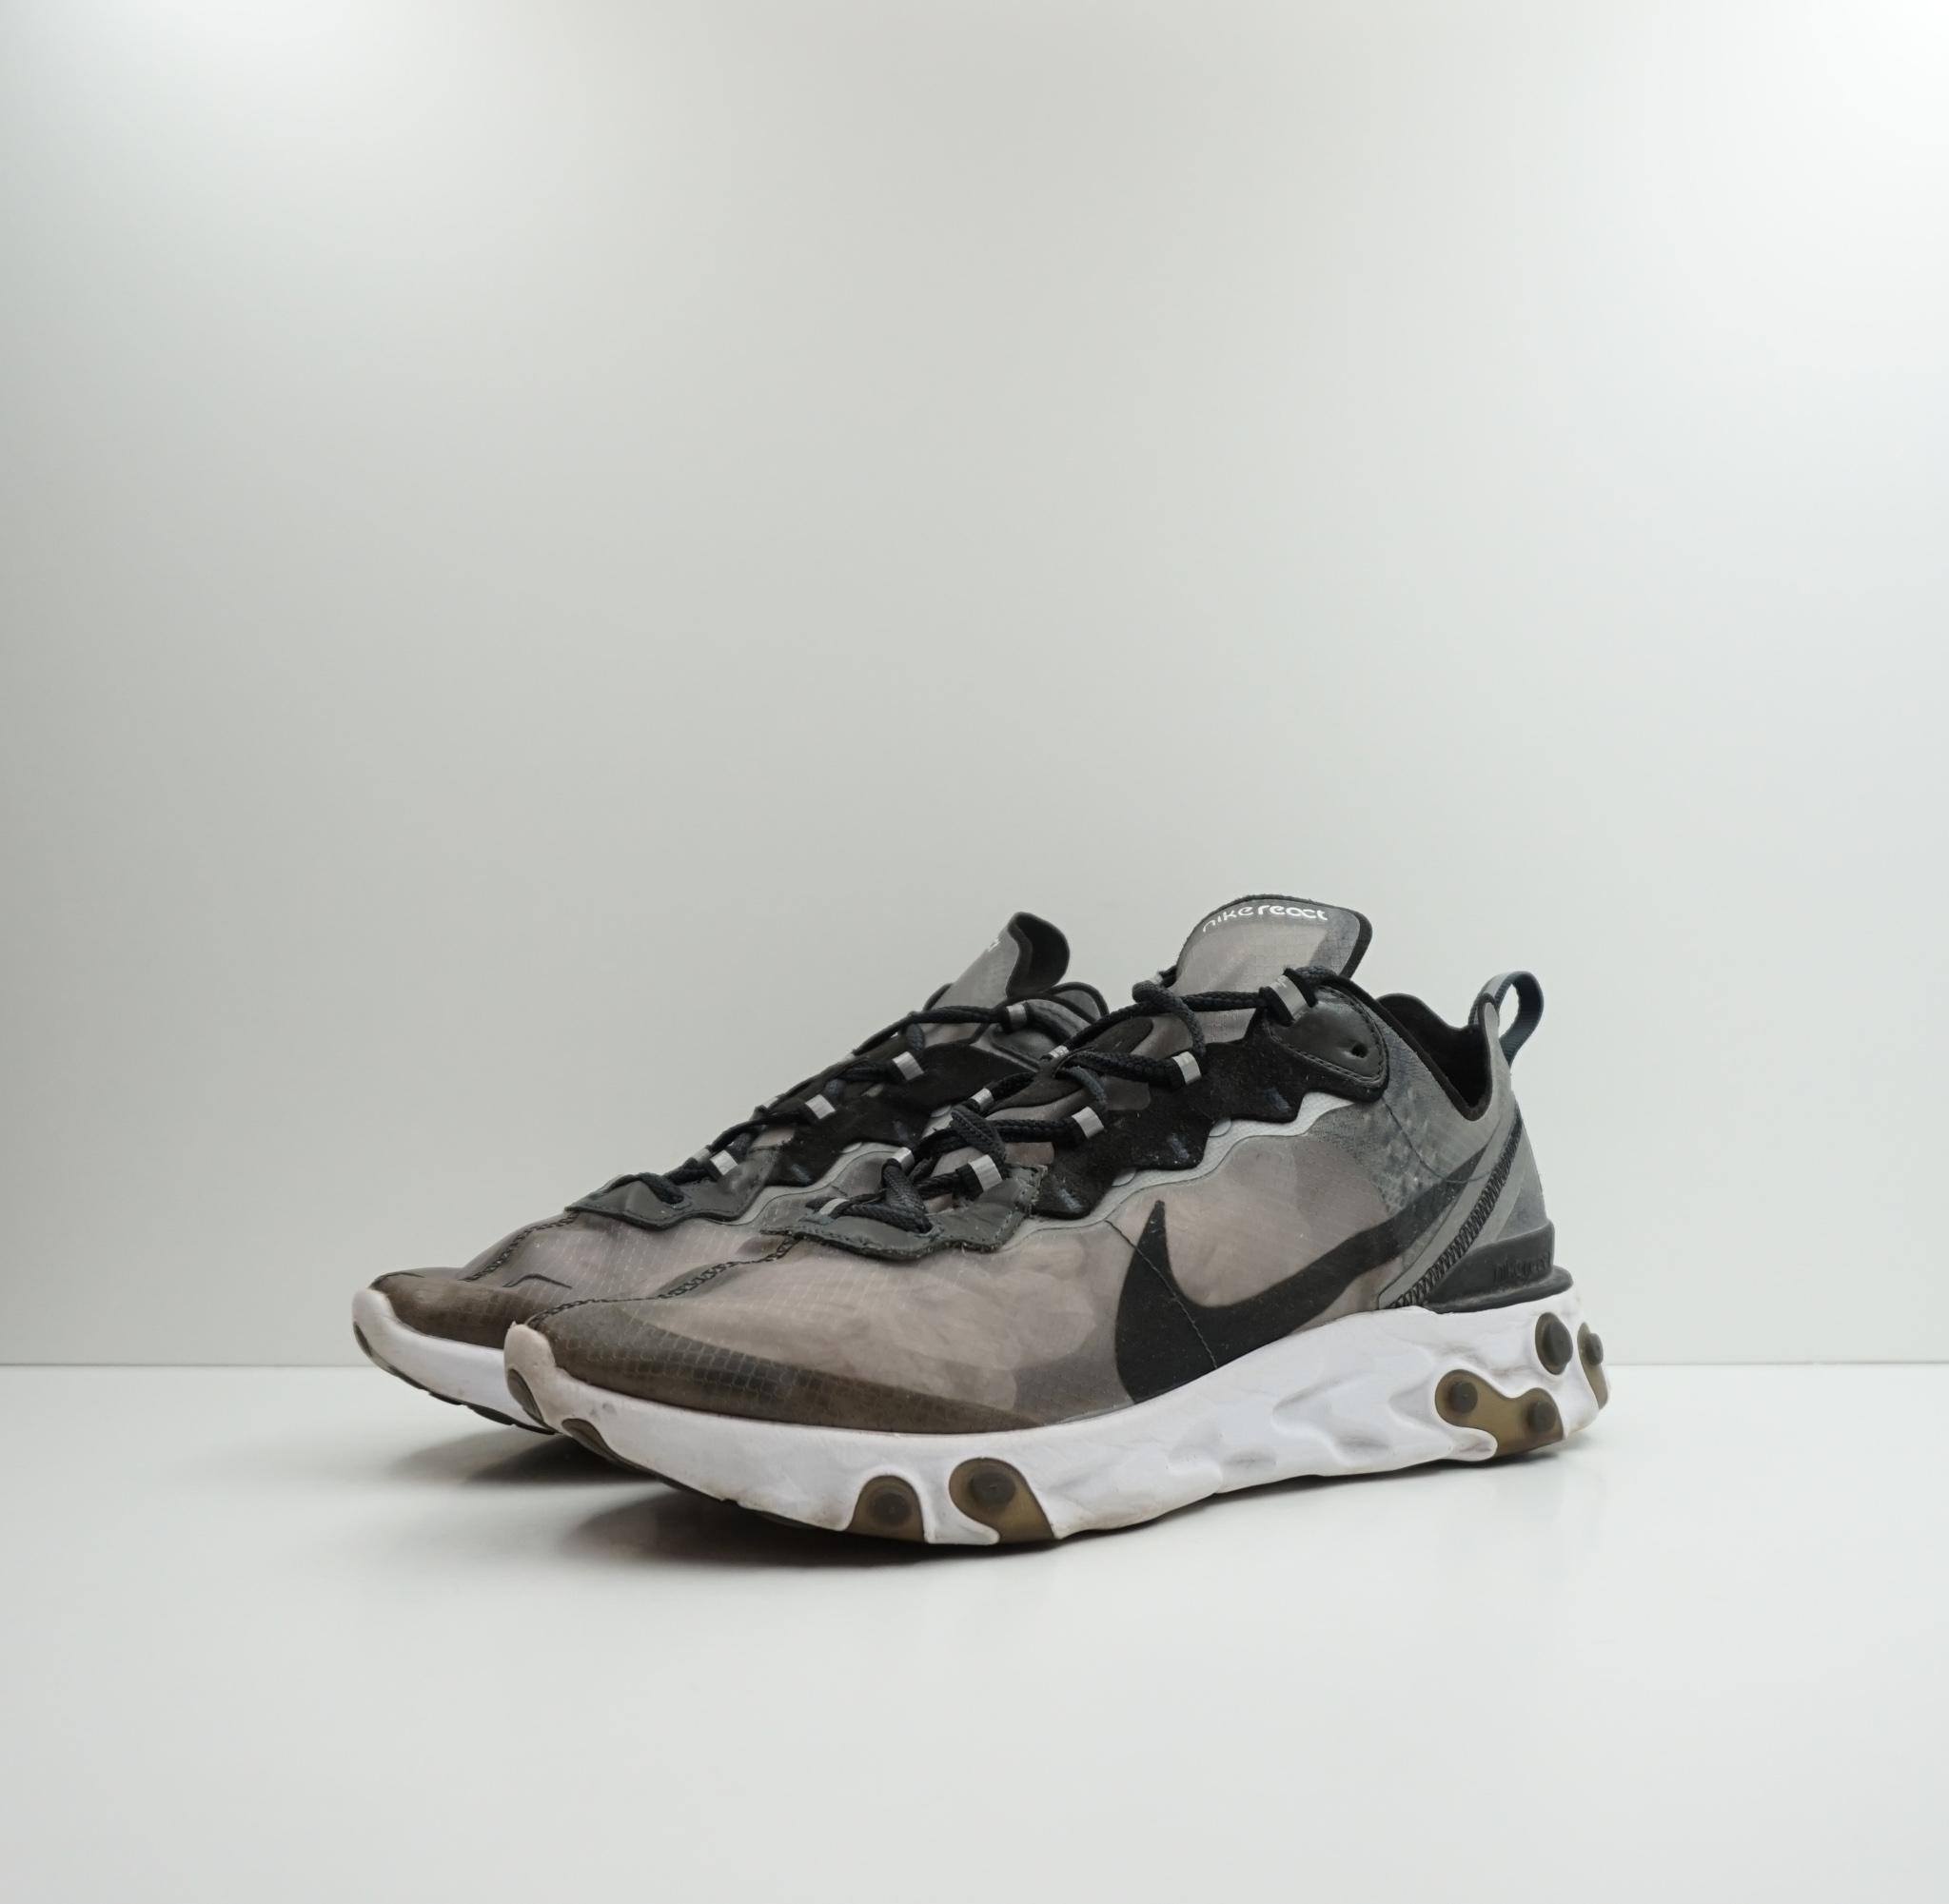 Nike React Element 87 Anthracite Black